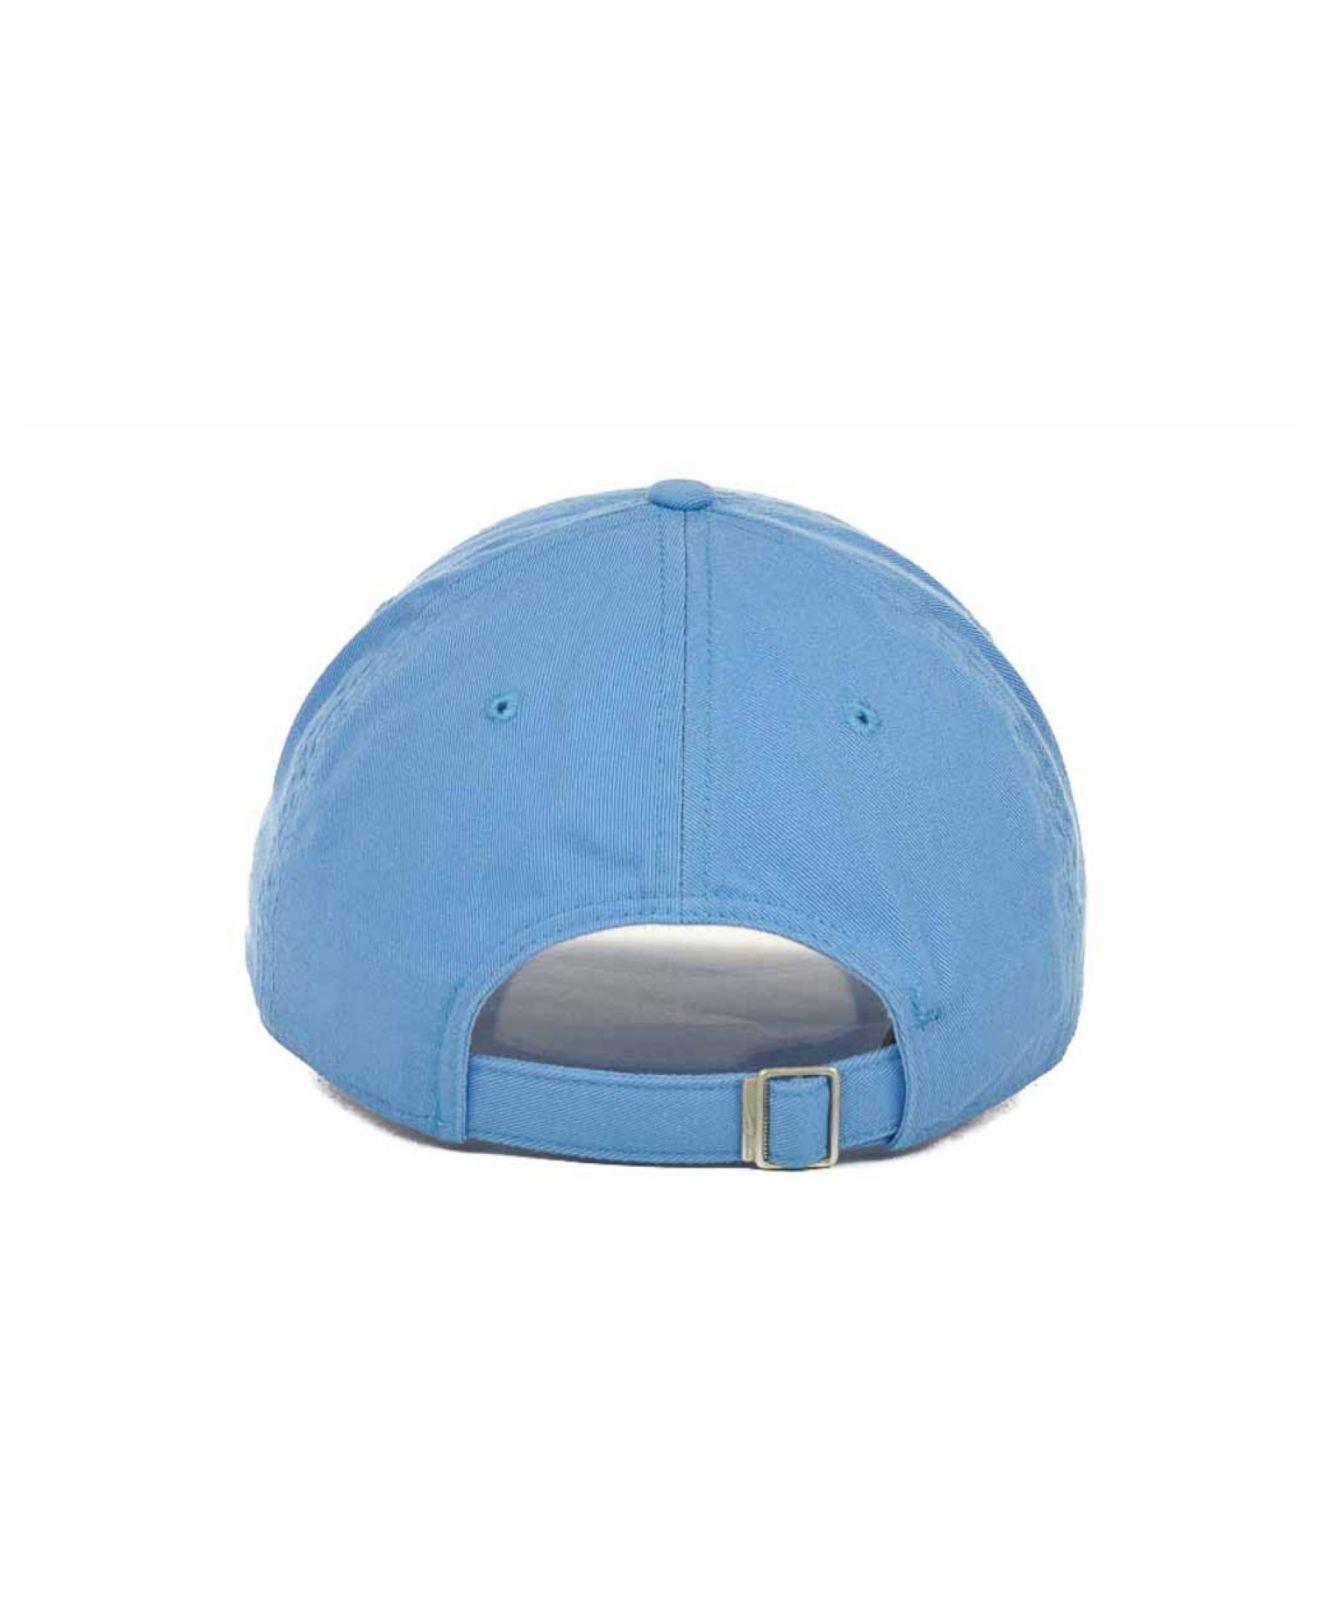 f1a12e88008571 ... promo code for lyst nike womens new york yankees stadium cap in blue  3a870 60cf7 ...